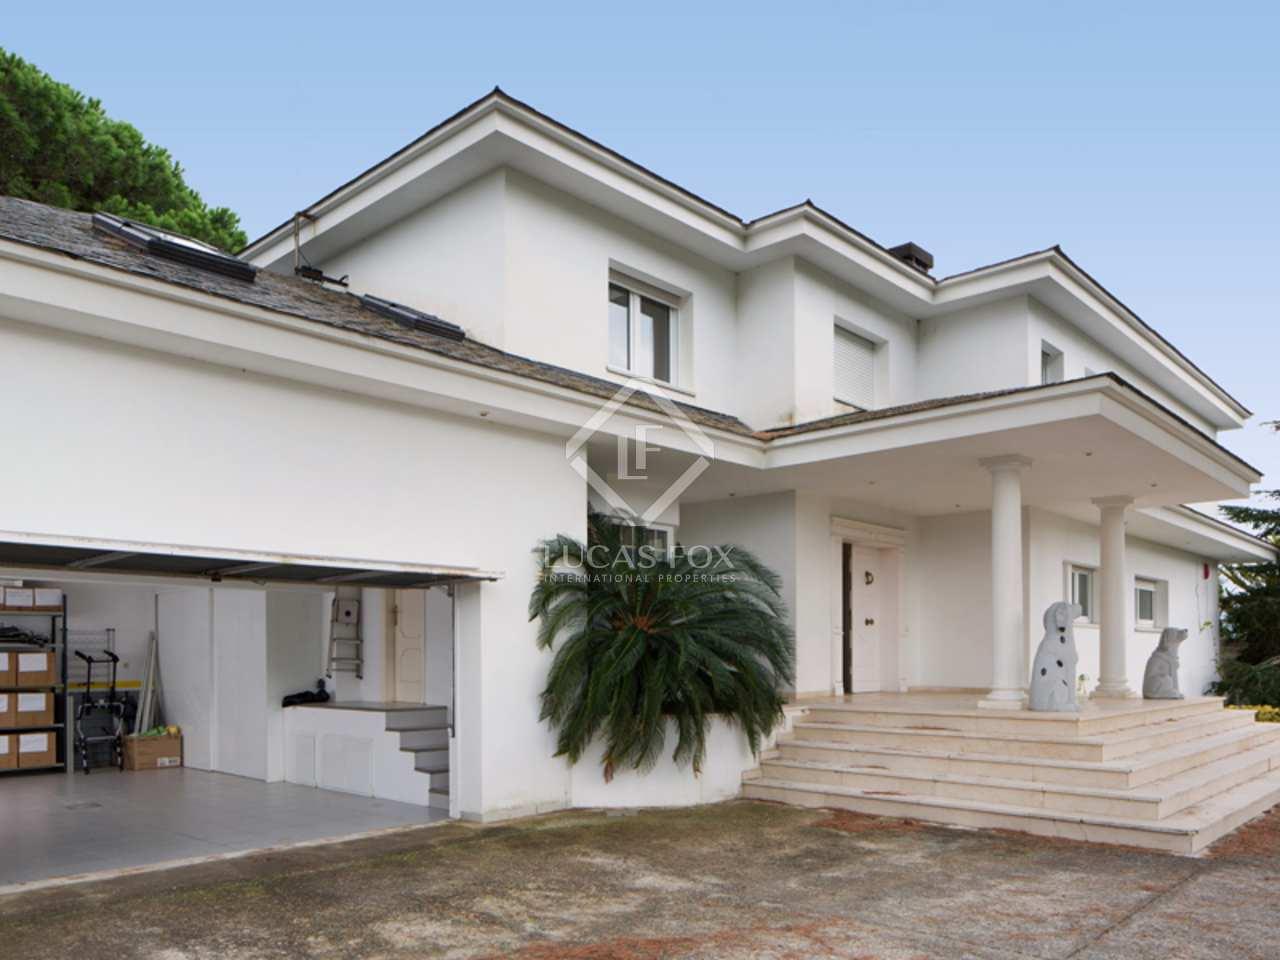 Villa bien construida en venta en arenys de munt en la - Casa arenys de munt ...